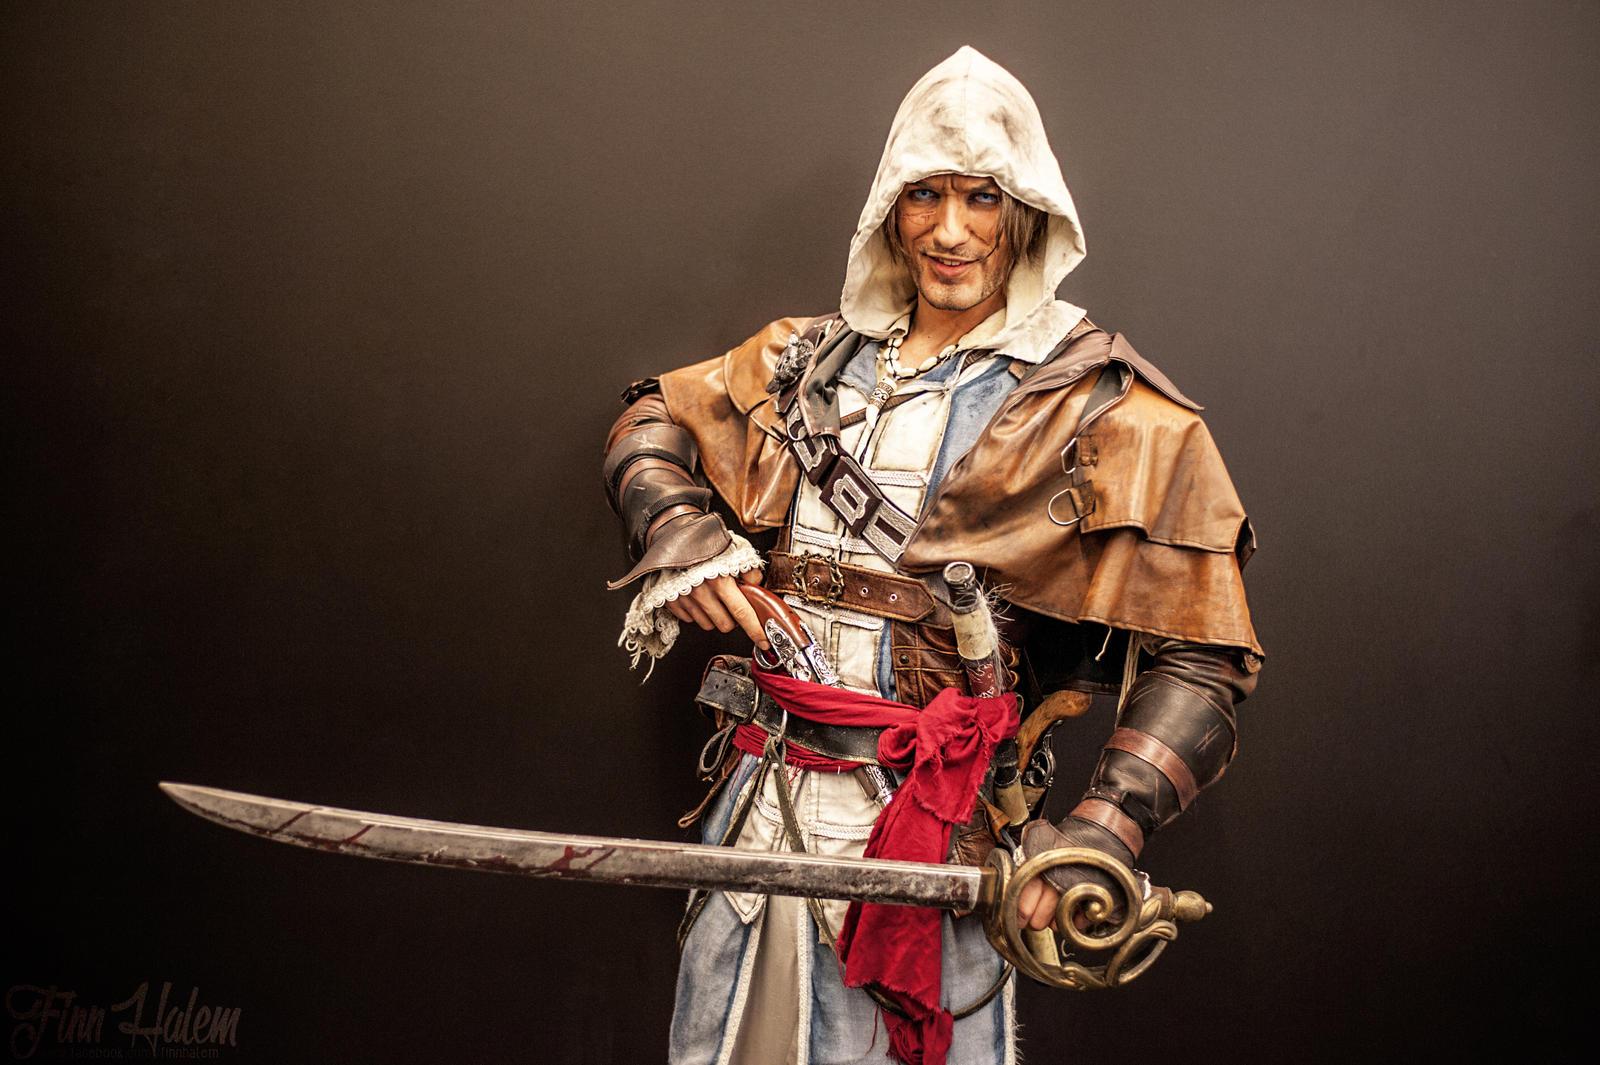 Edward Kenway Cosplay Assassin's Creed IV - PARLEY by LeonChiroCosplayArt